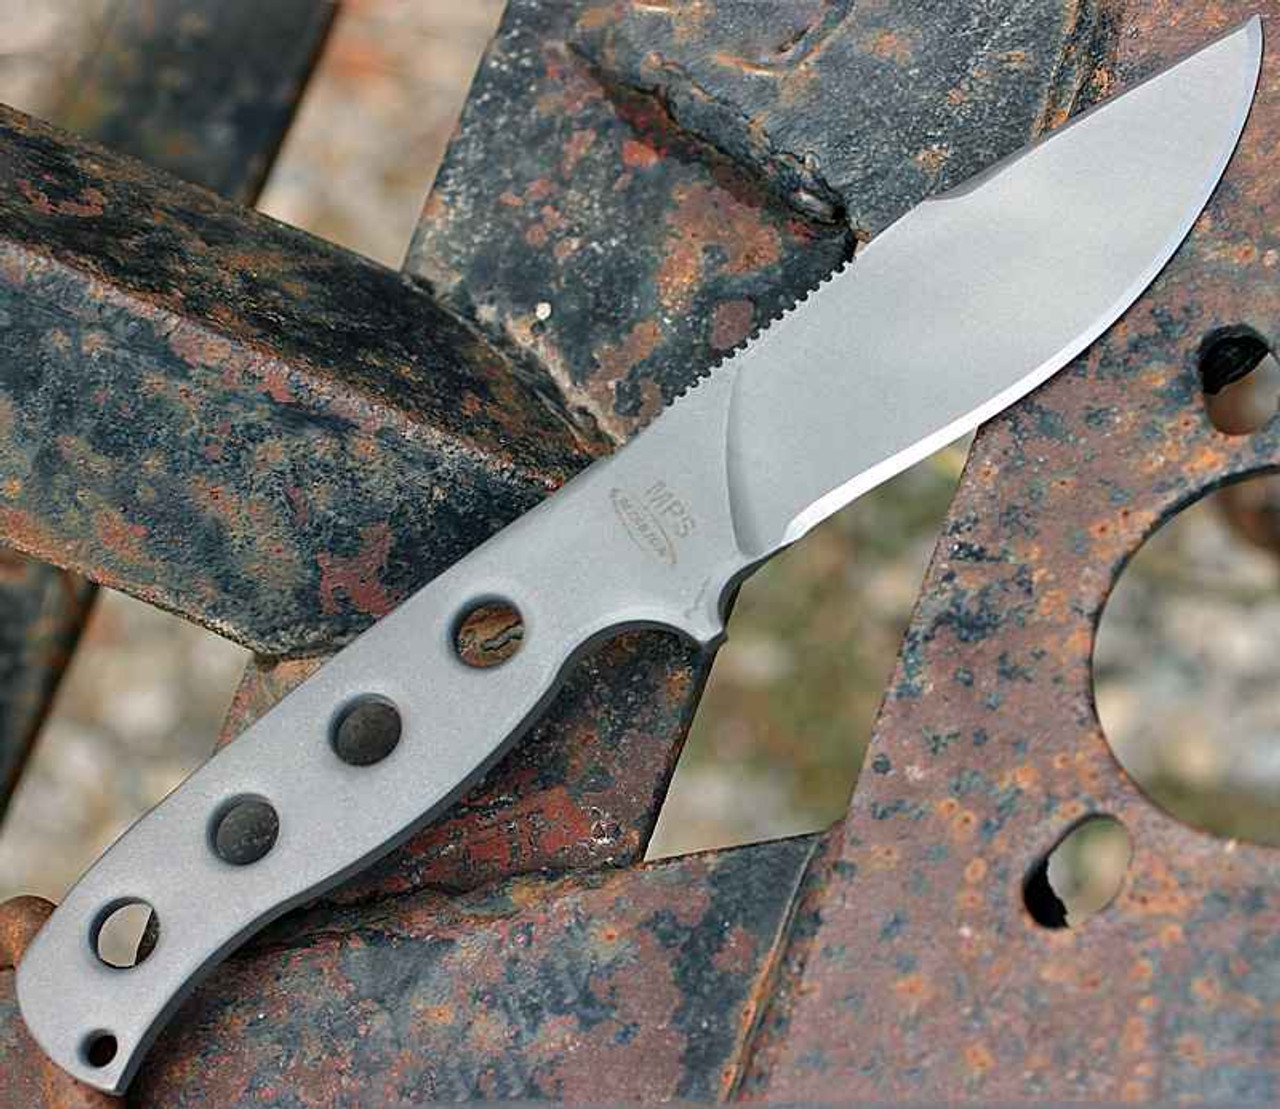 Mission MPS-Ti, Titanium Blade, Skeletonized handle, Plain Edge